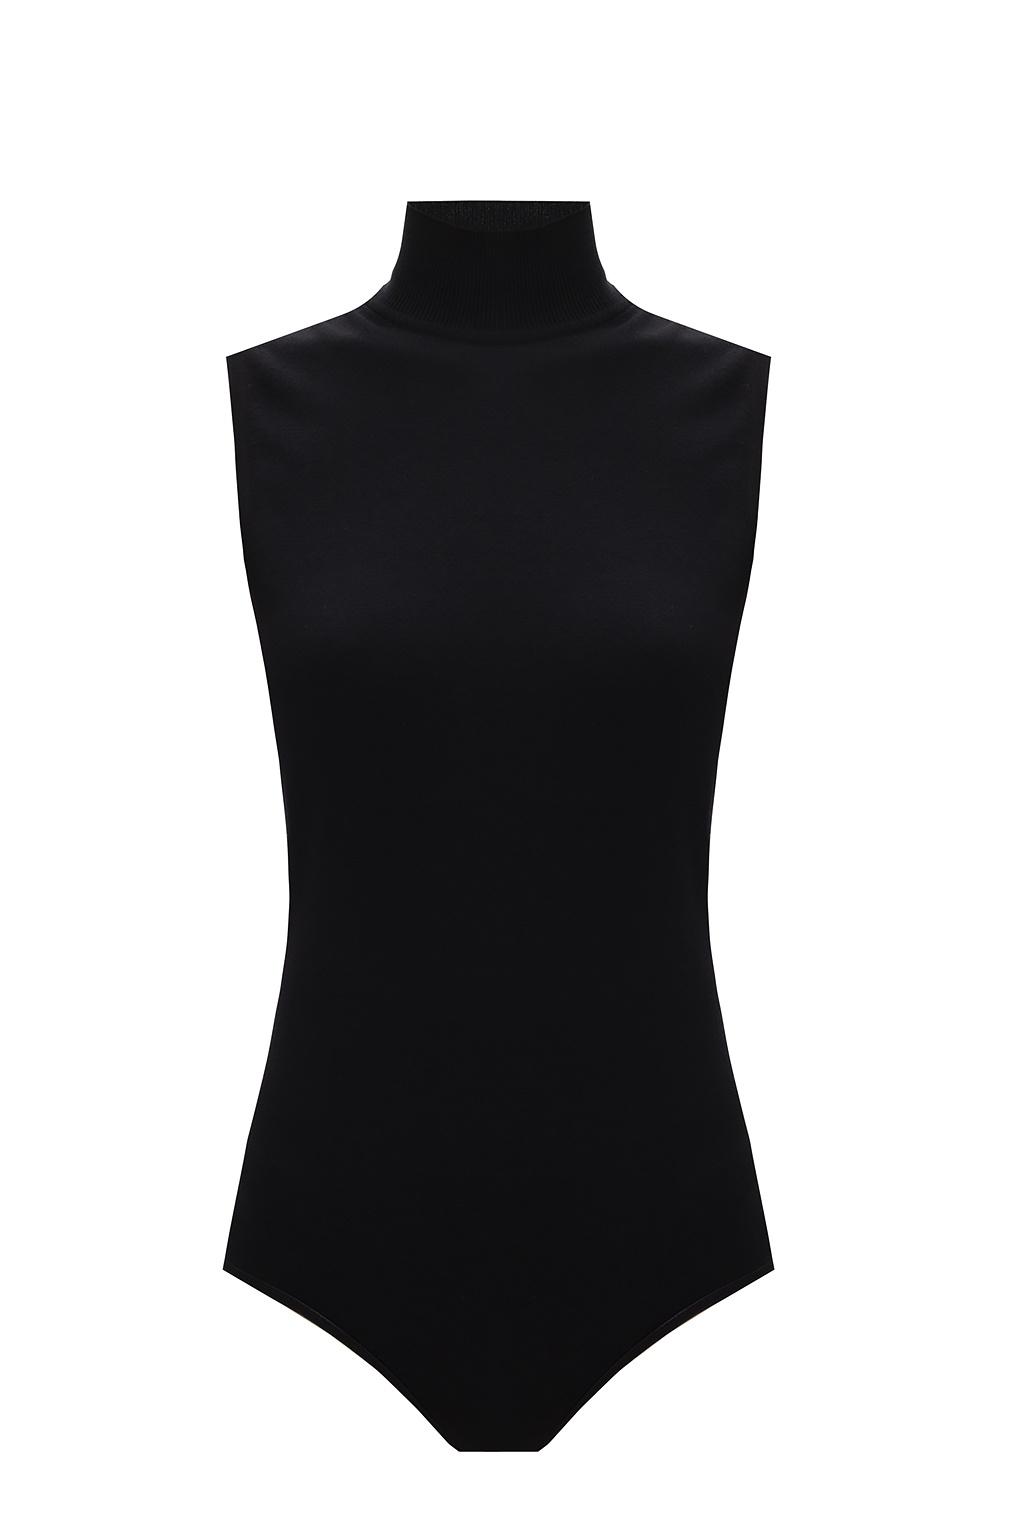 Alaia Wool bodysuit